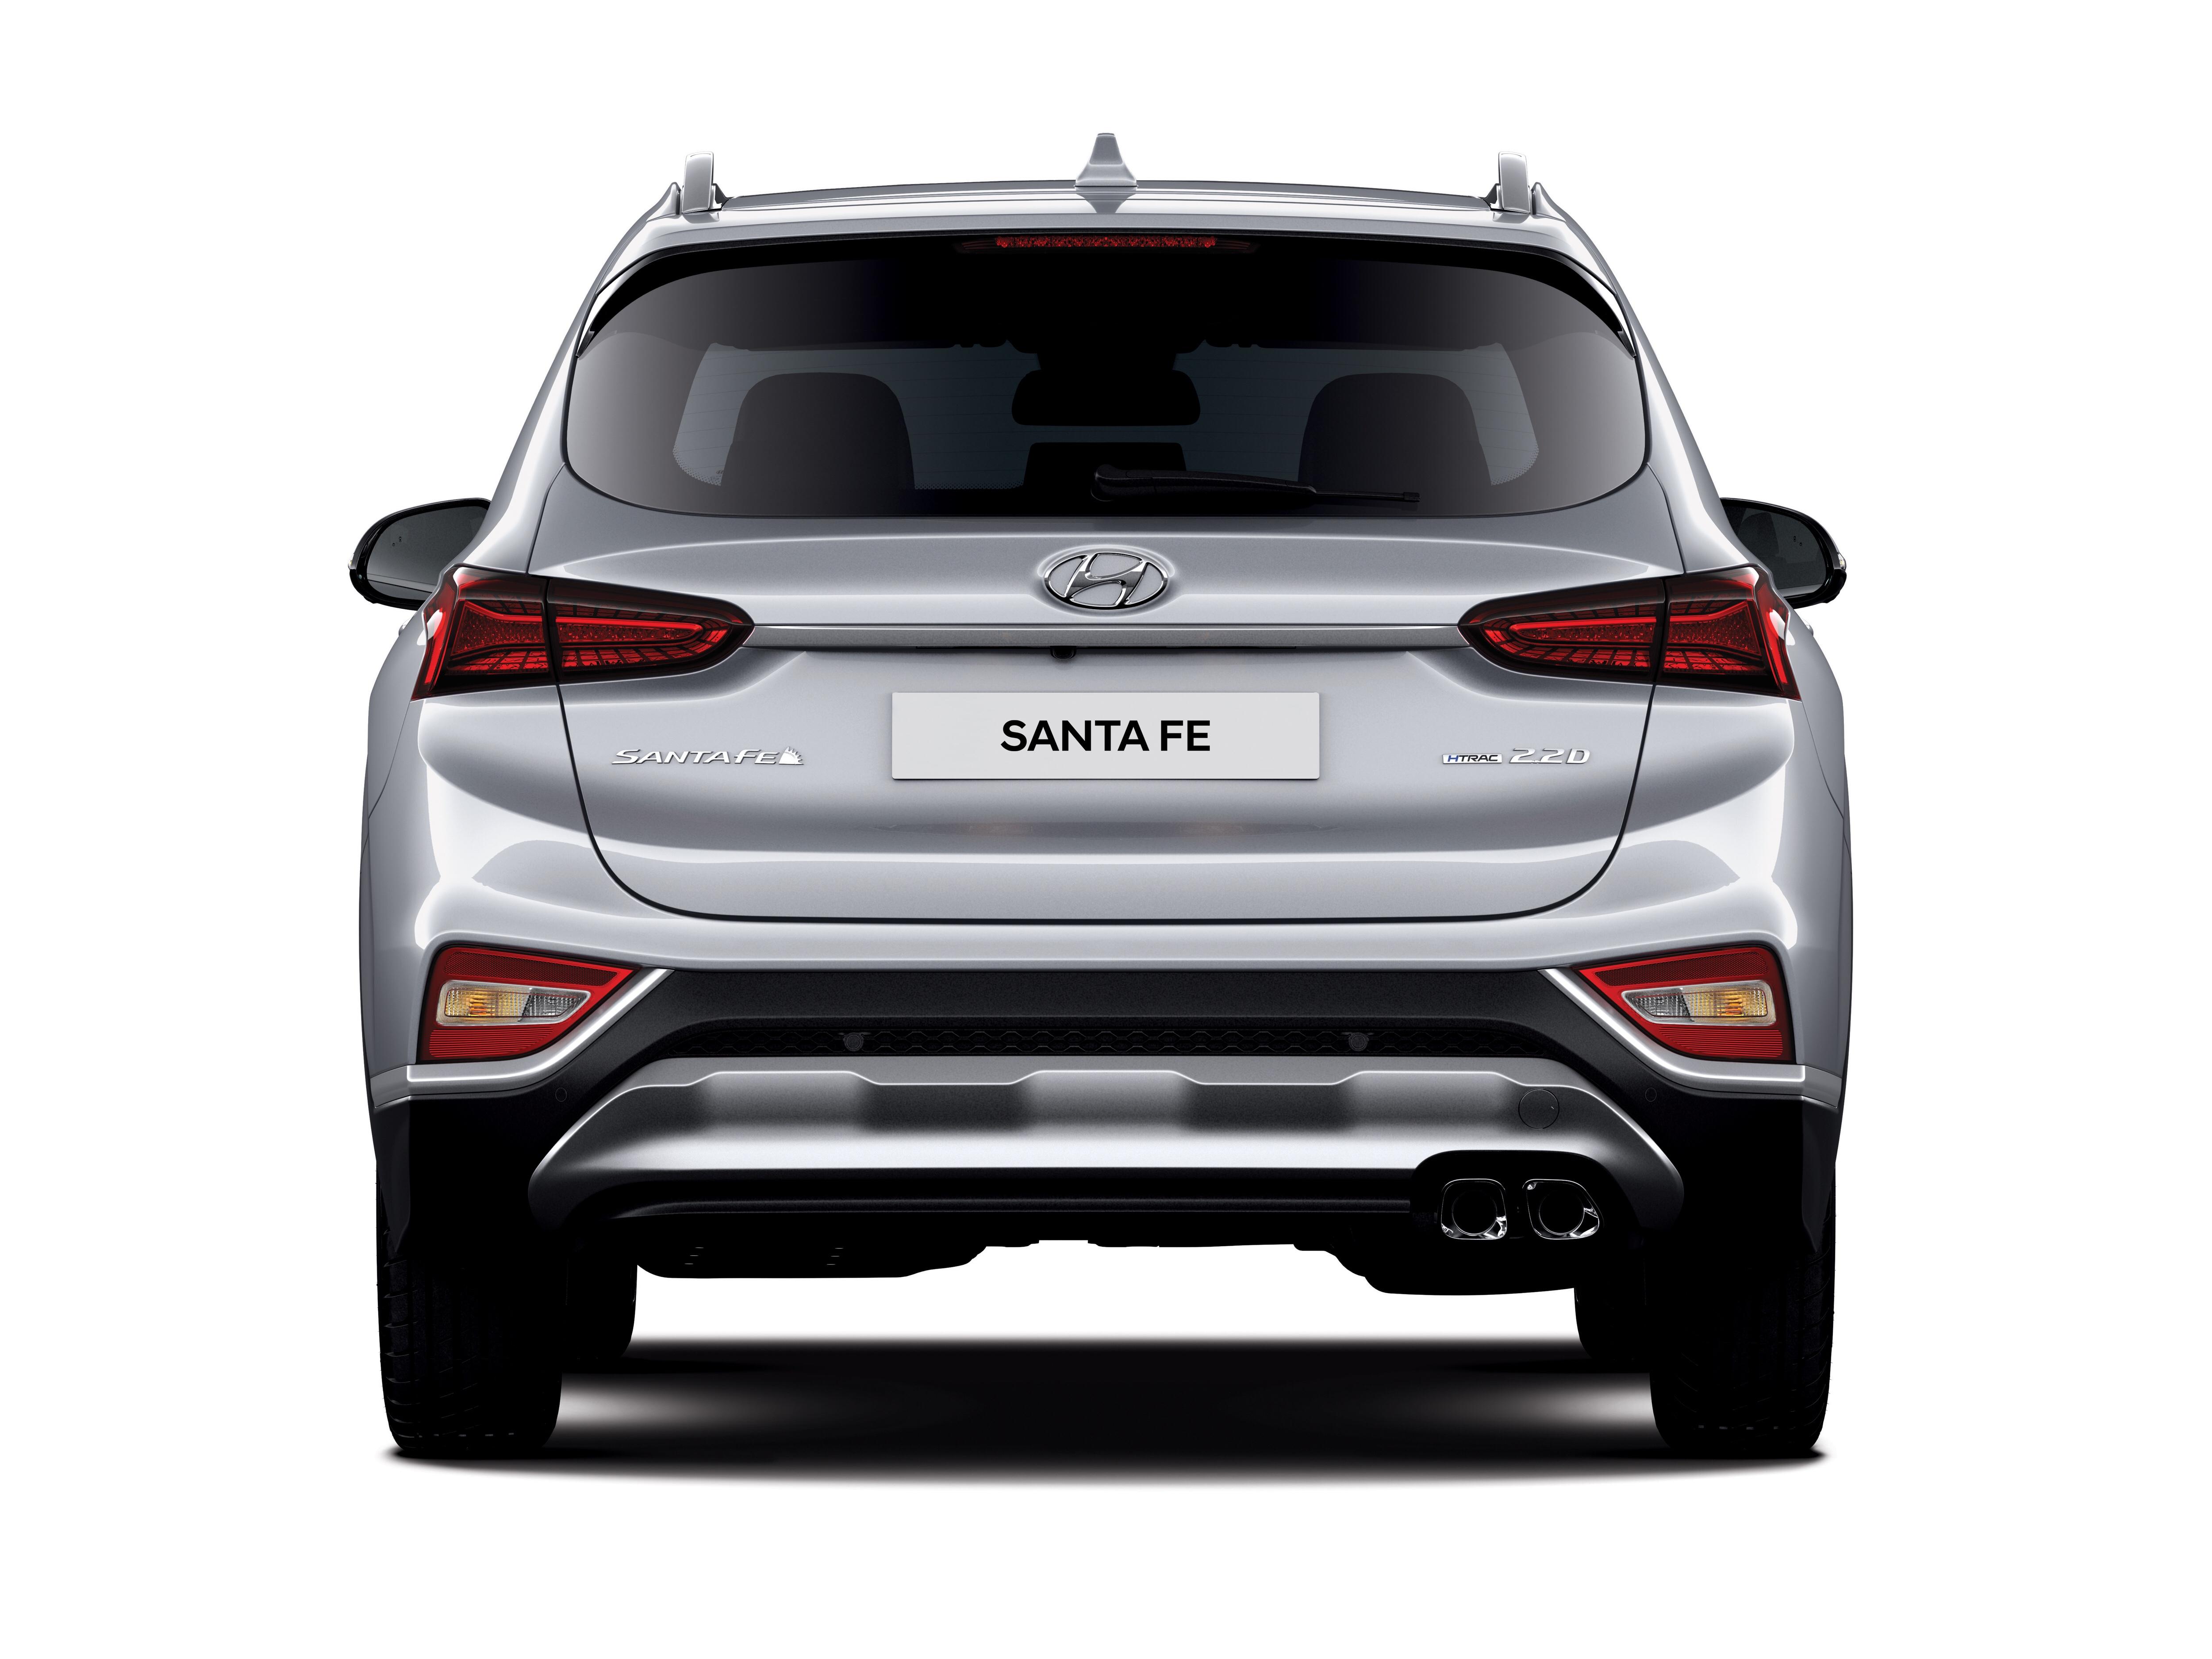 2019 Santa Fe to be First Hyundai US Diesel Vehicle